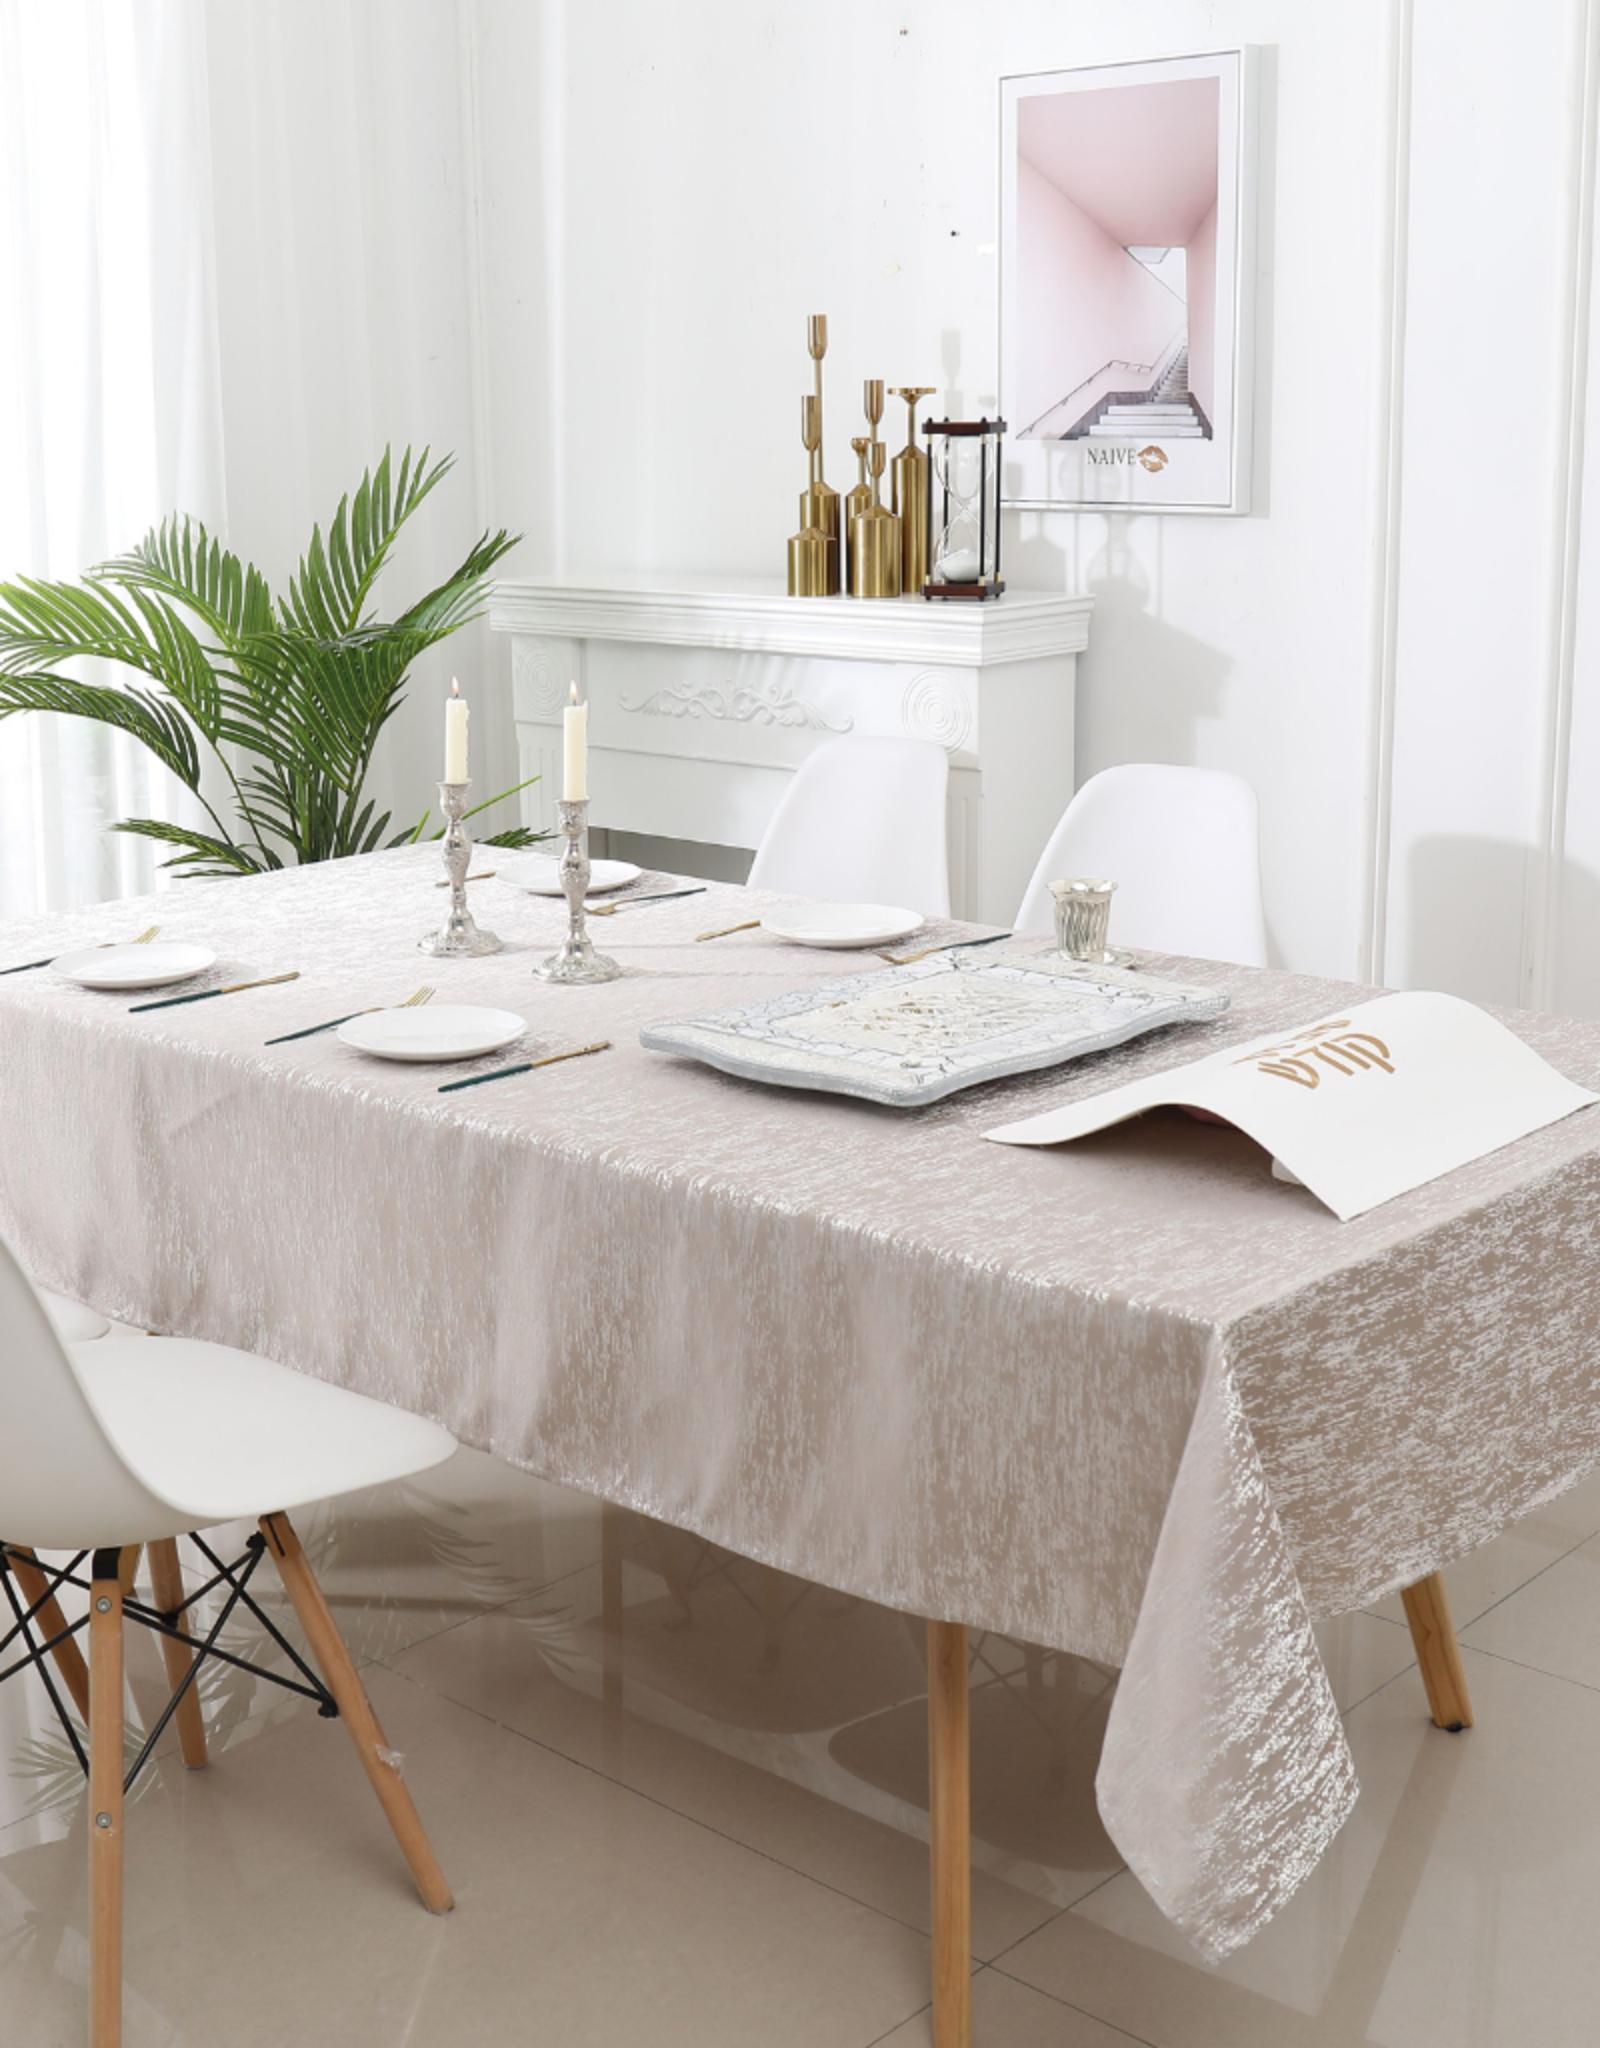 Jacquard Champagne Tablecloth #1323